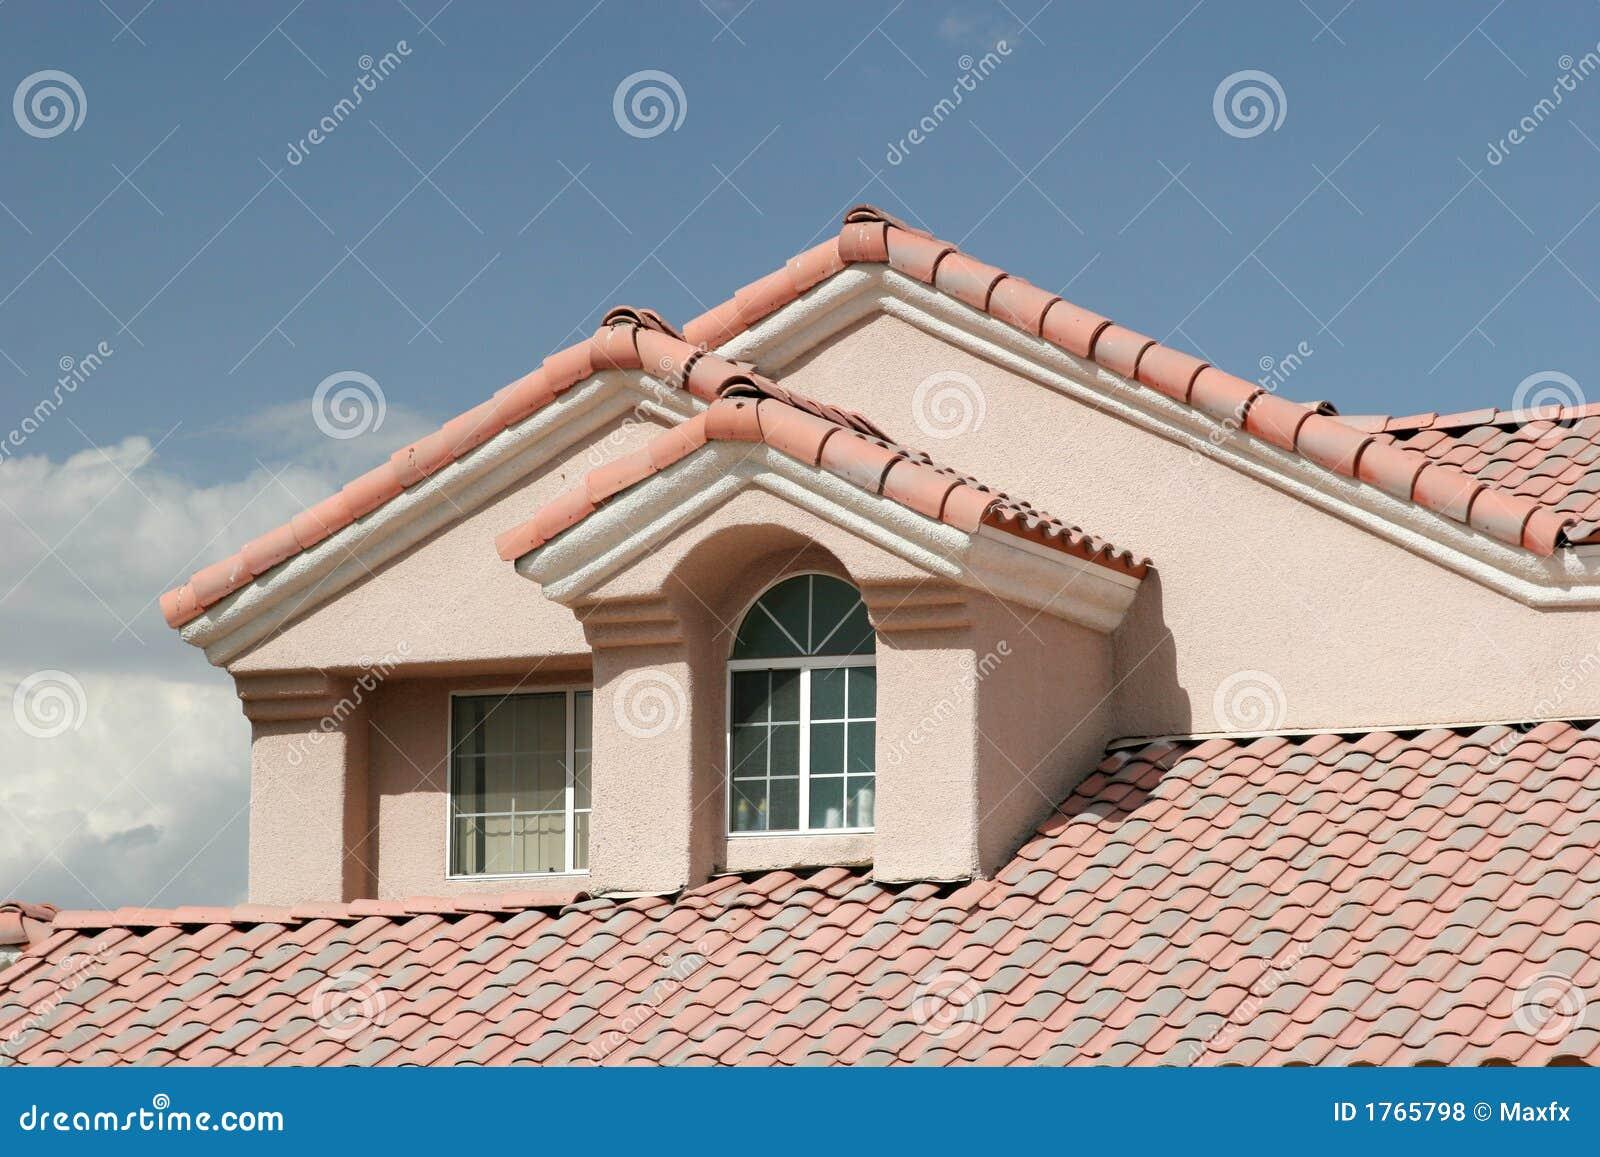 Southwest Home Royalty Free Stock Photos Image 1765798